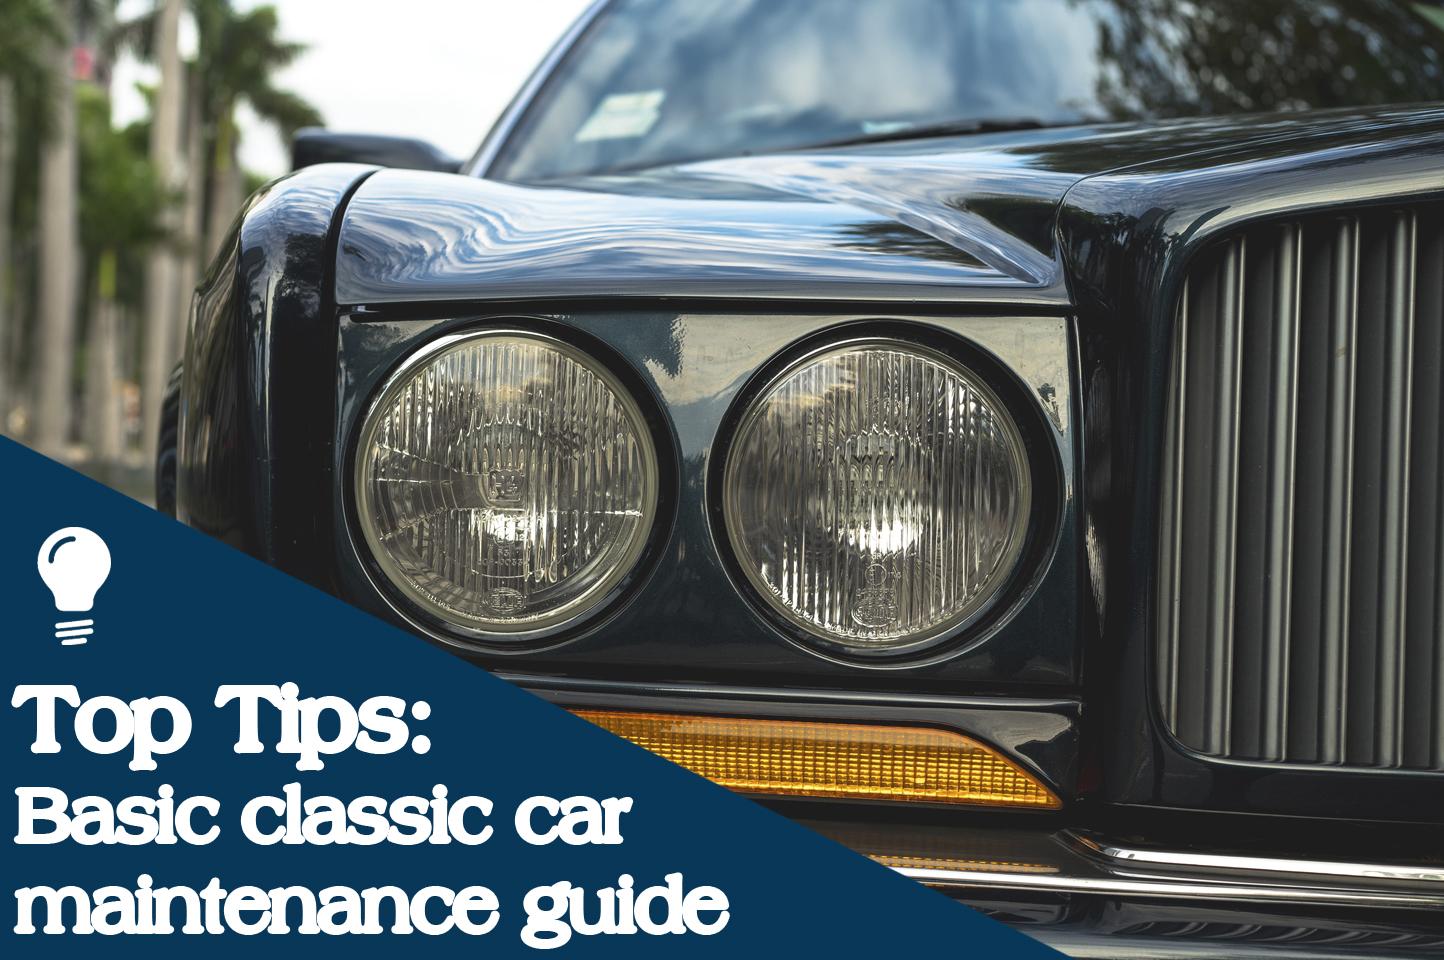 Top Tips: Basic classic car maintenance guide